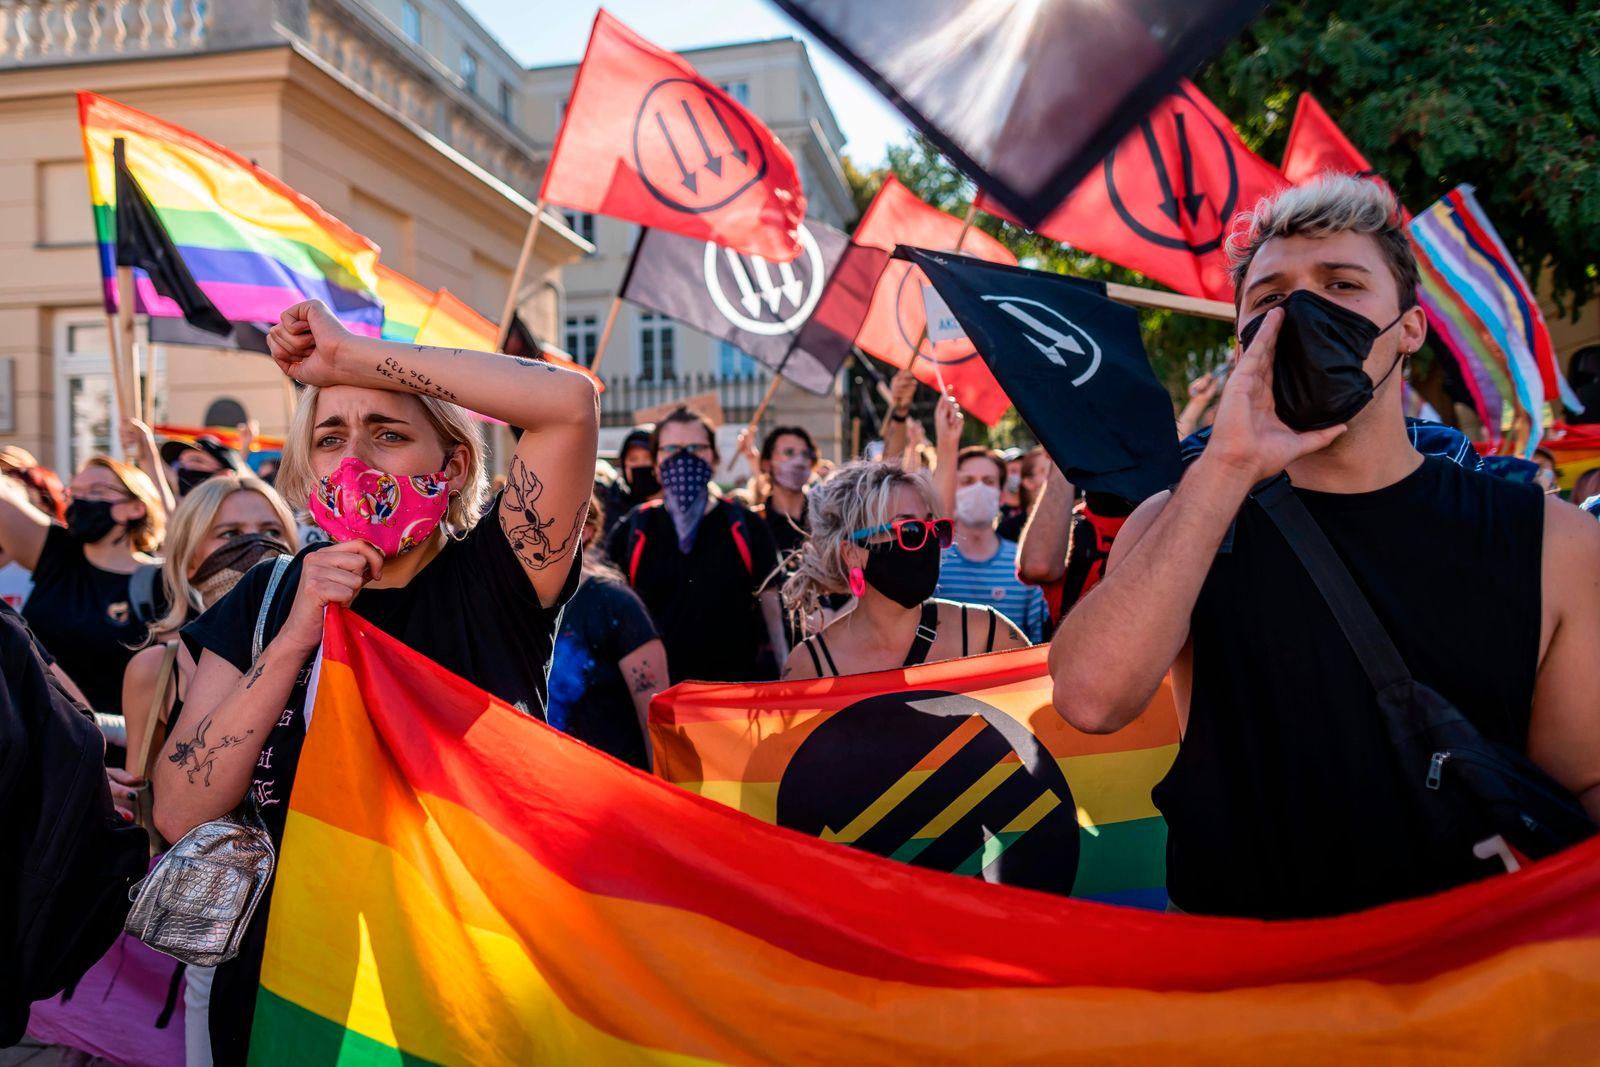 Ambassadors urge Poland to respect LGBT rights